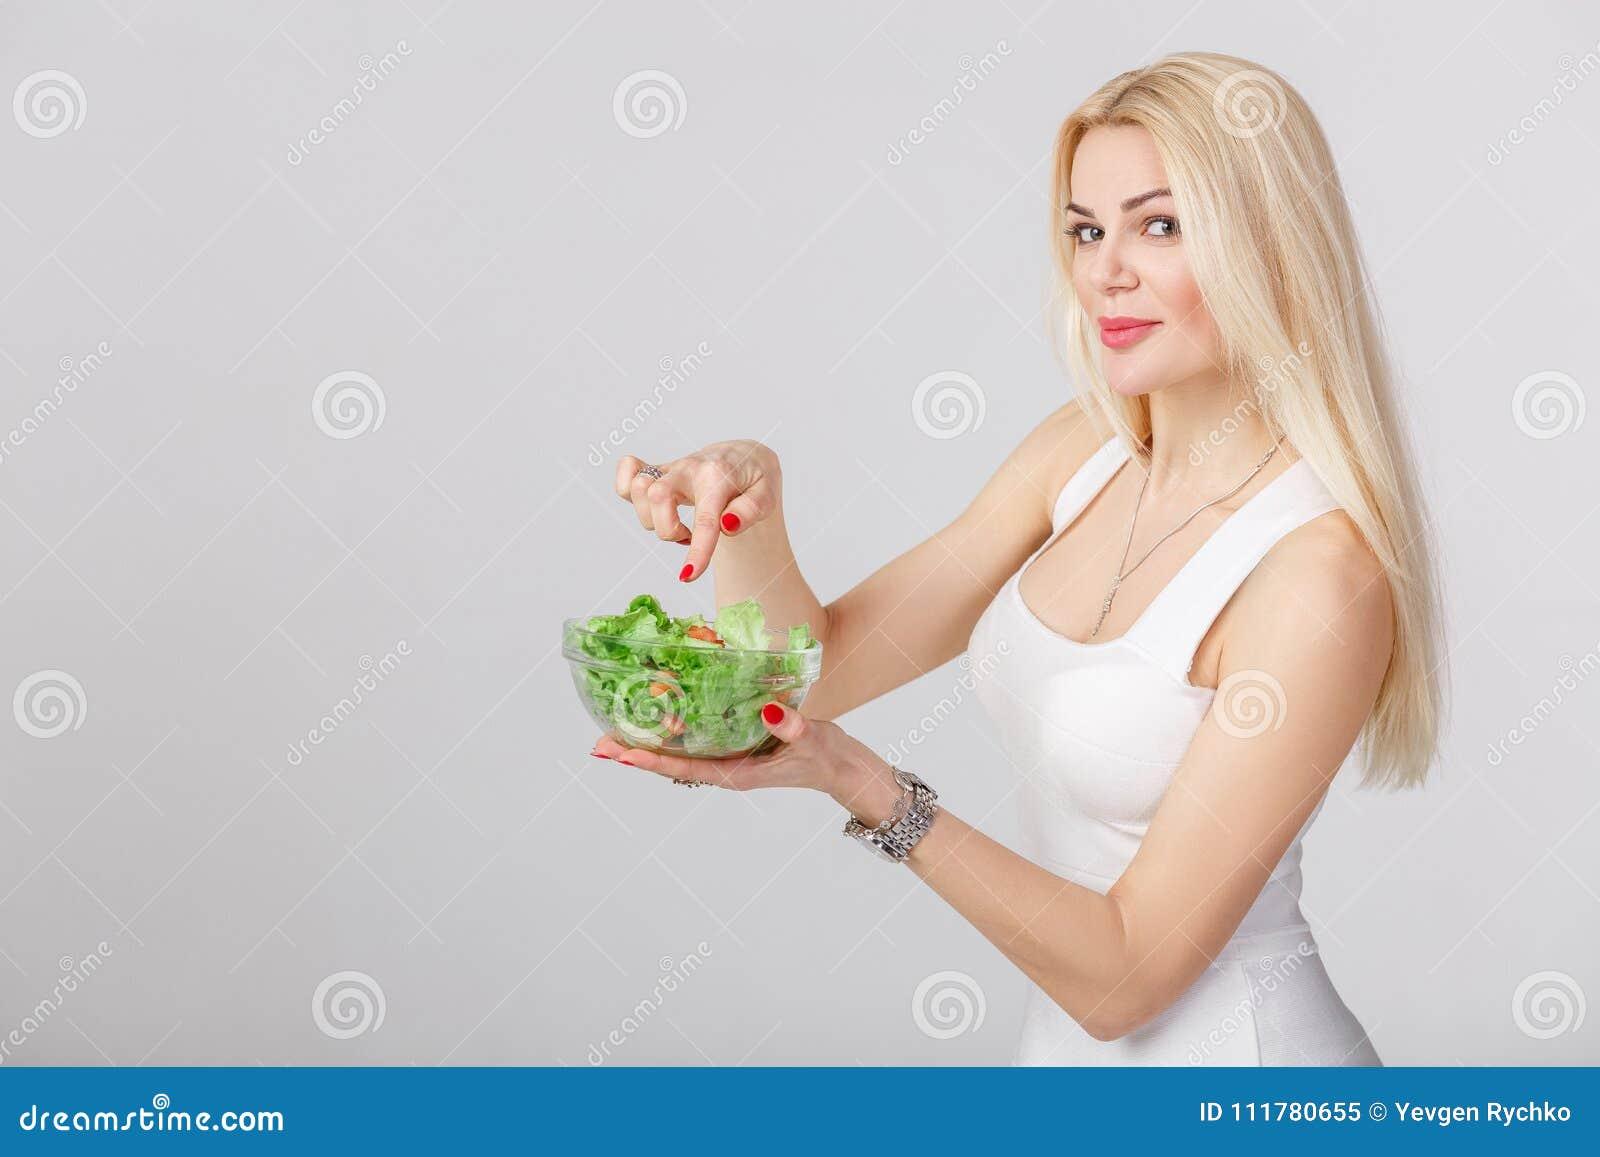 Vrouw in witte kleding met verse salade